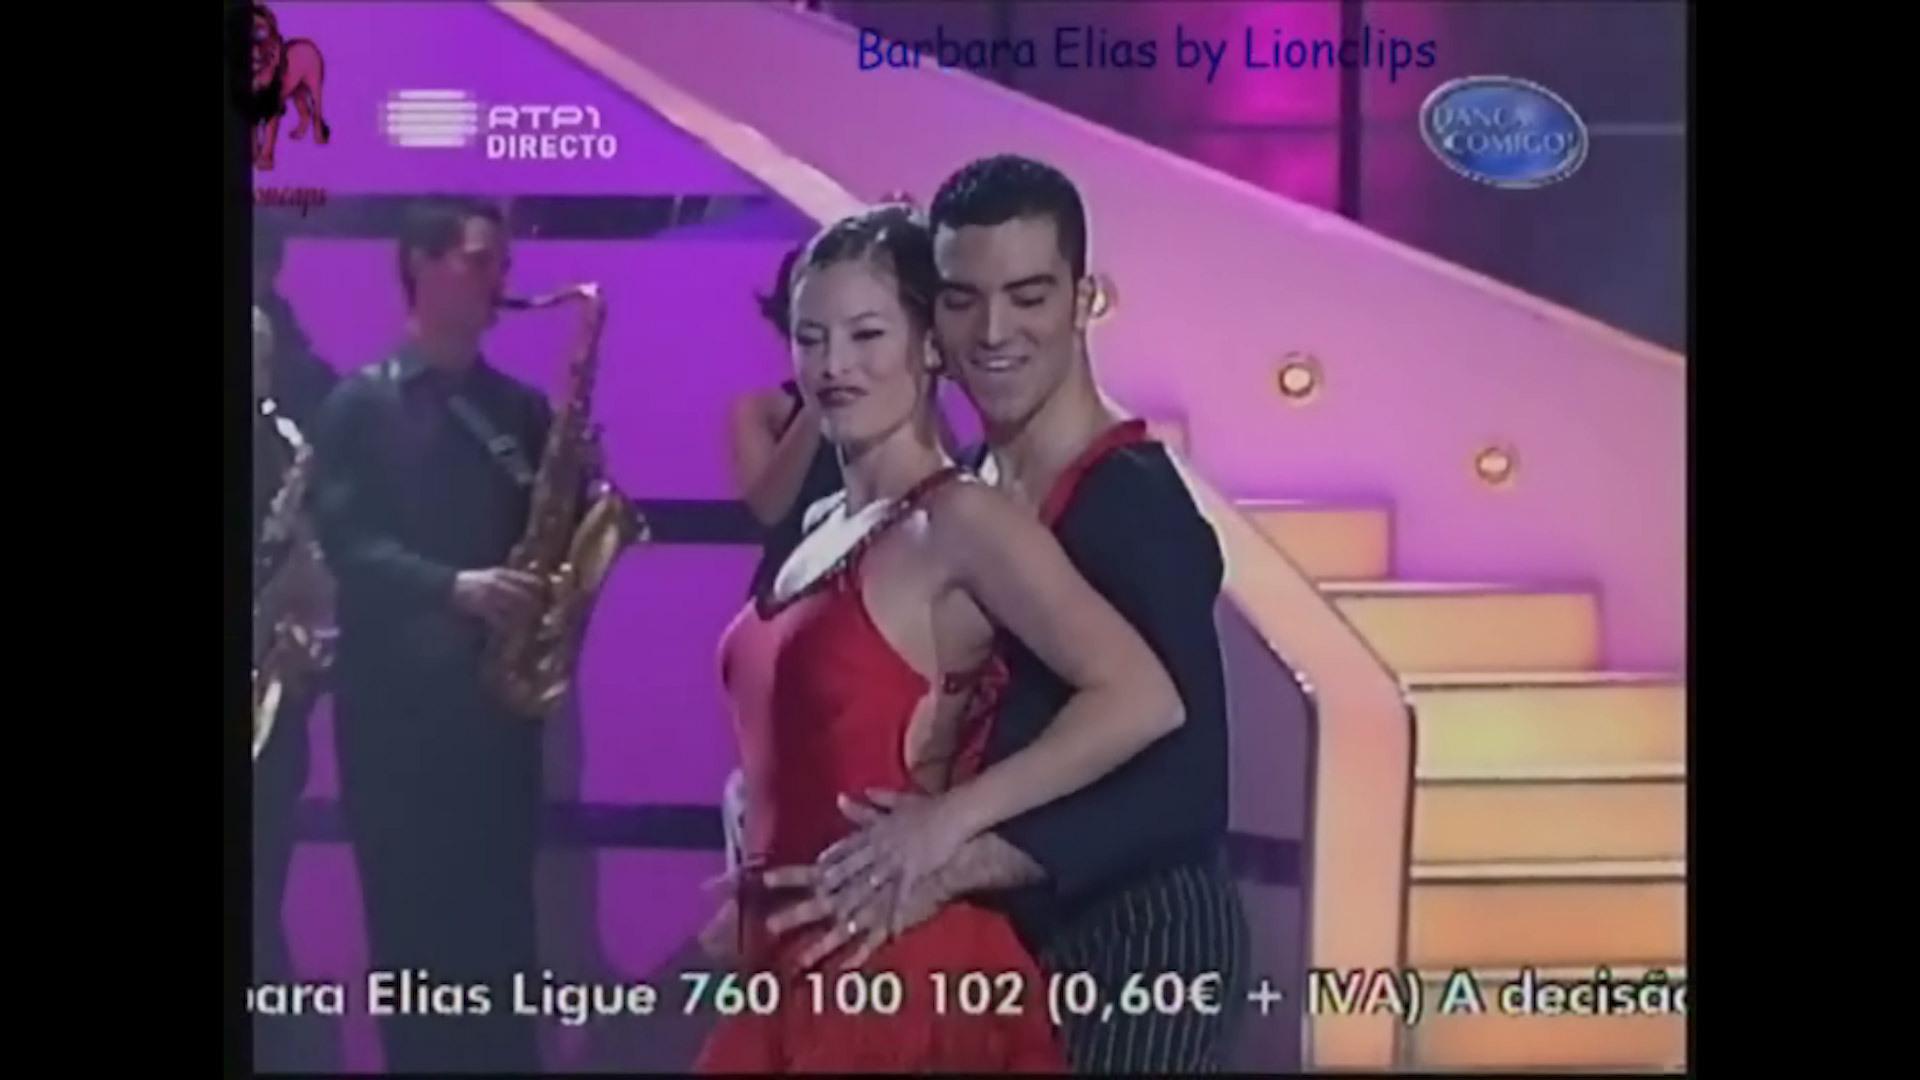 best_off_portugal_b_lioncaps_13_12_2020_01 (9).jpg